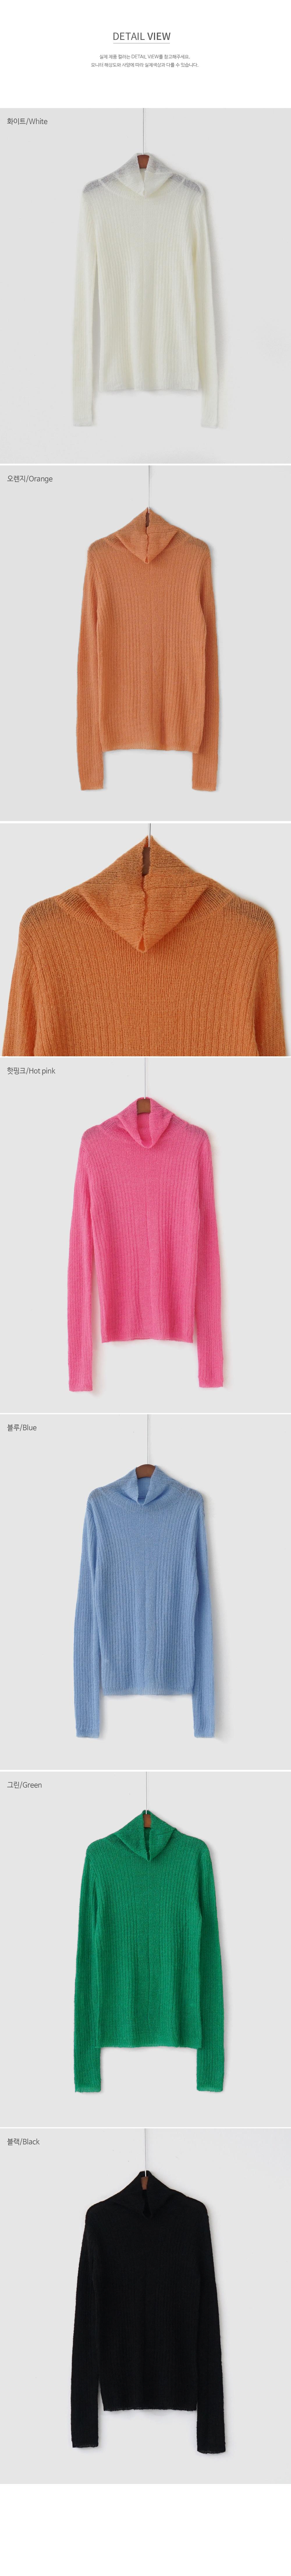 Vivid Turtleneck Sweater-holiholic.com